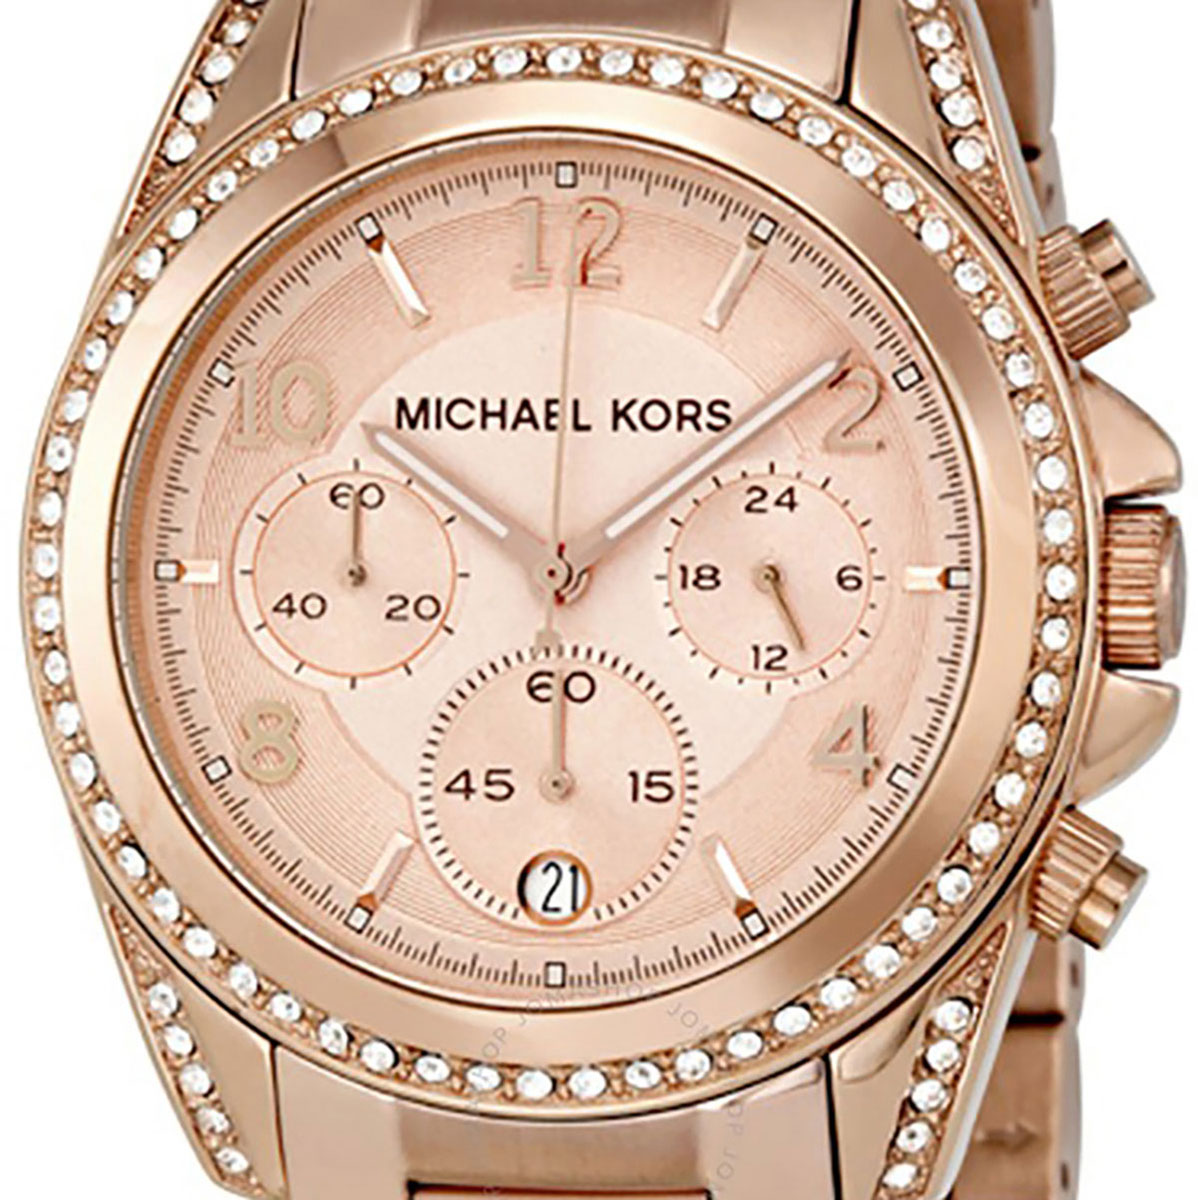 Michael Kors マイケル・コース 電池式クォーツ 腕時計 [MK5263] 並行輸入品  デイト クロノグラフ